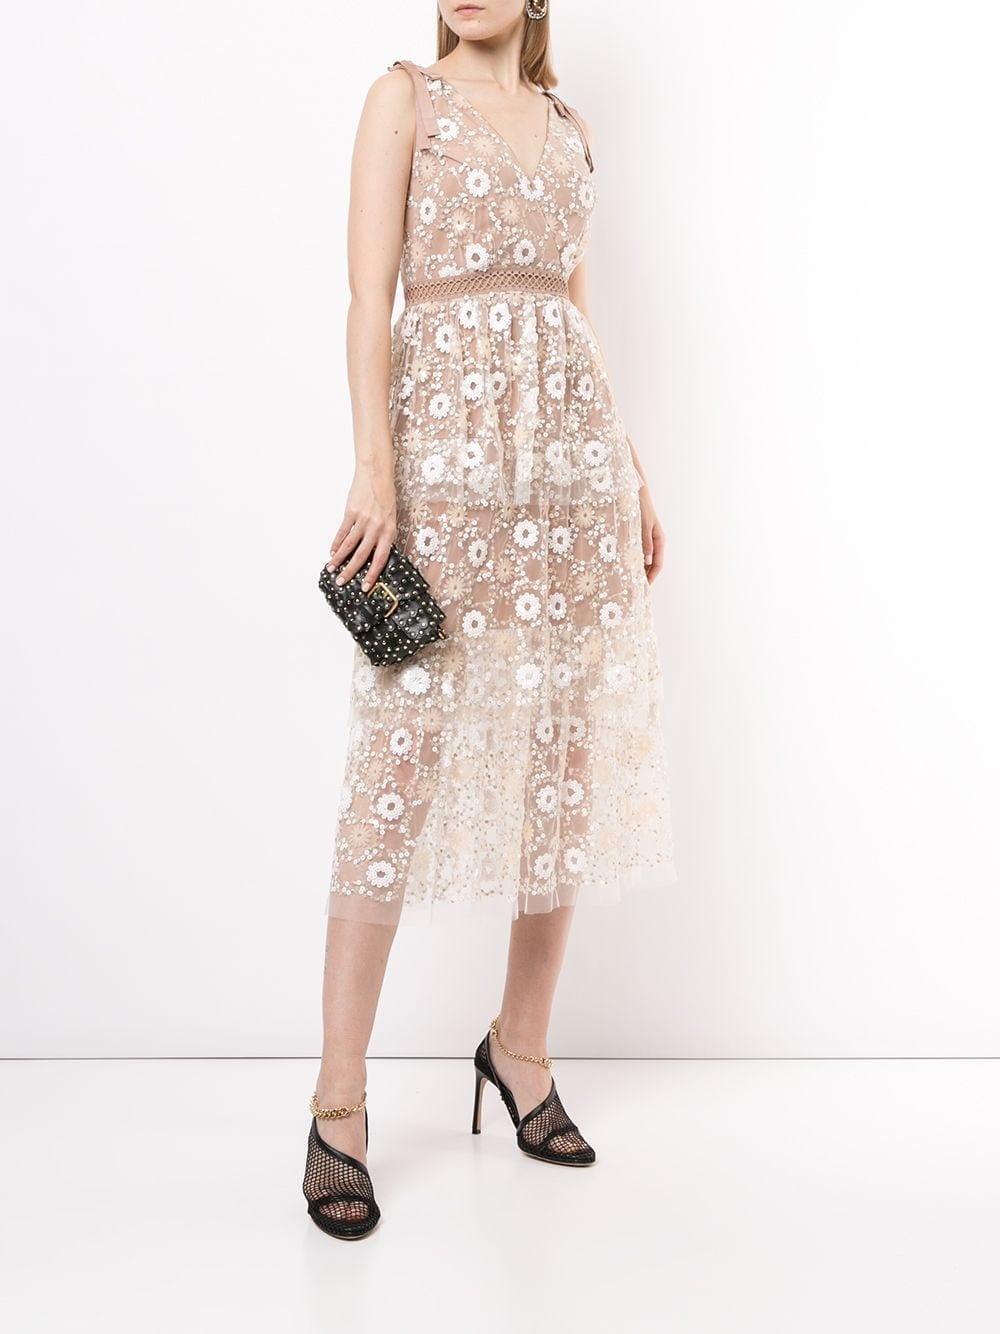 SELF-PORTRAIT Tiered Floral-sequin Dress